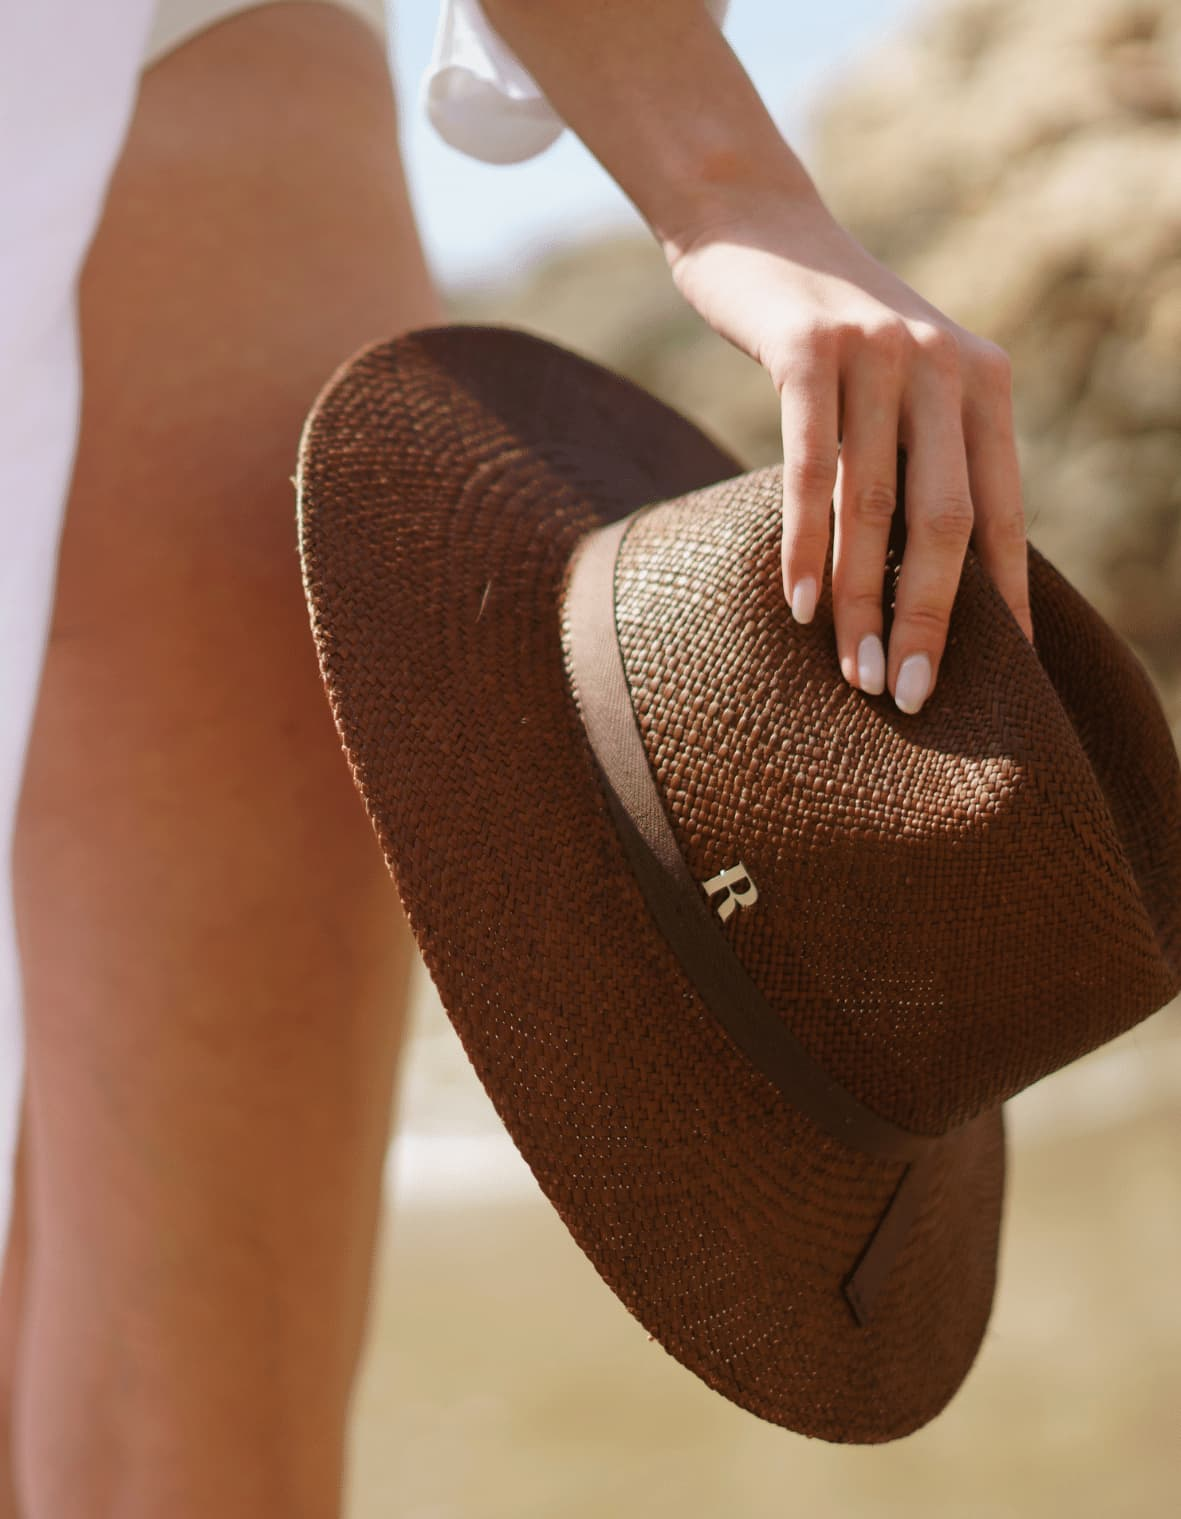 Paros Panama Fedora Hat for beach